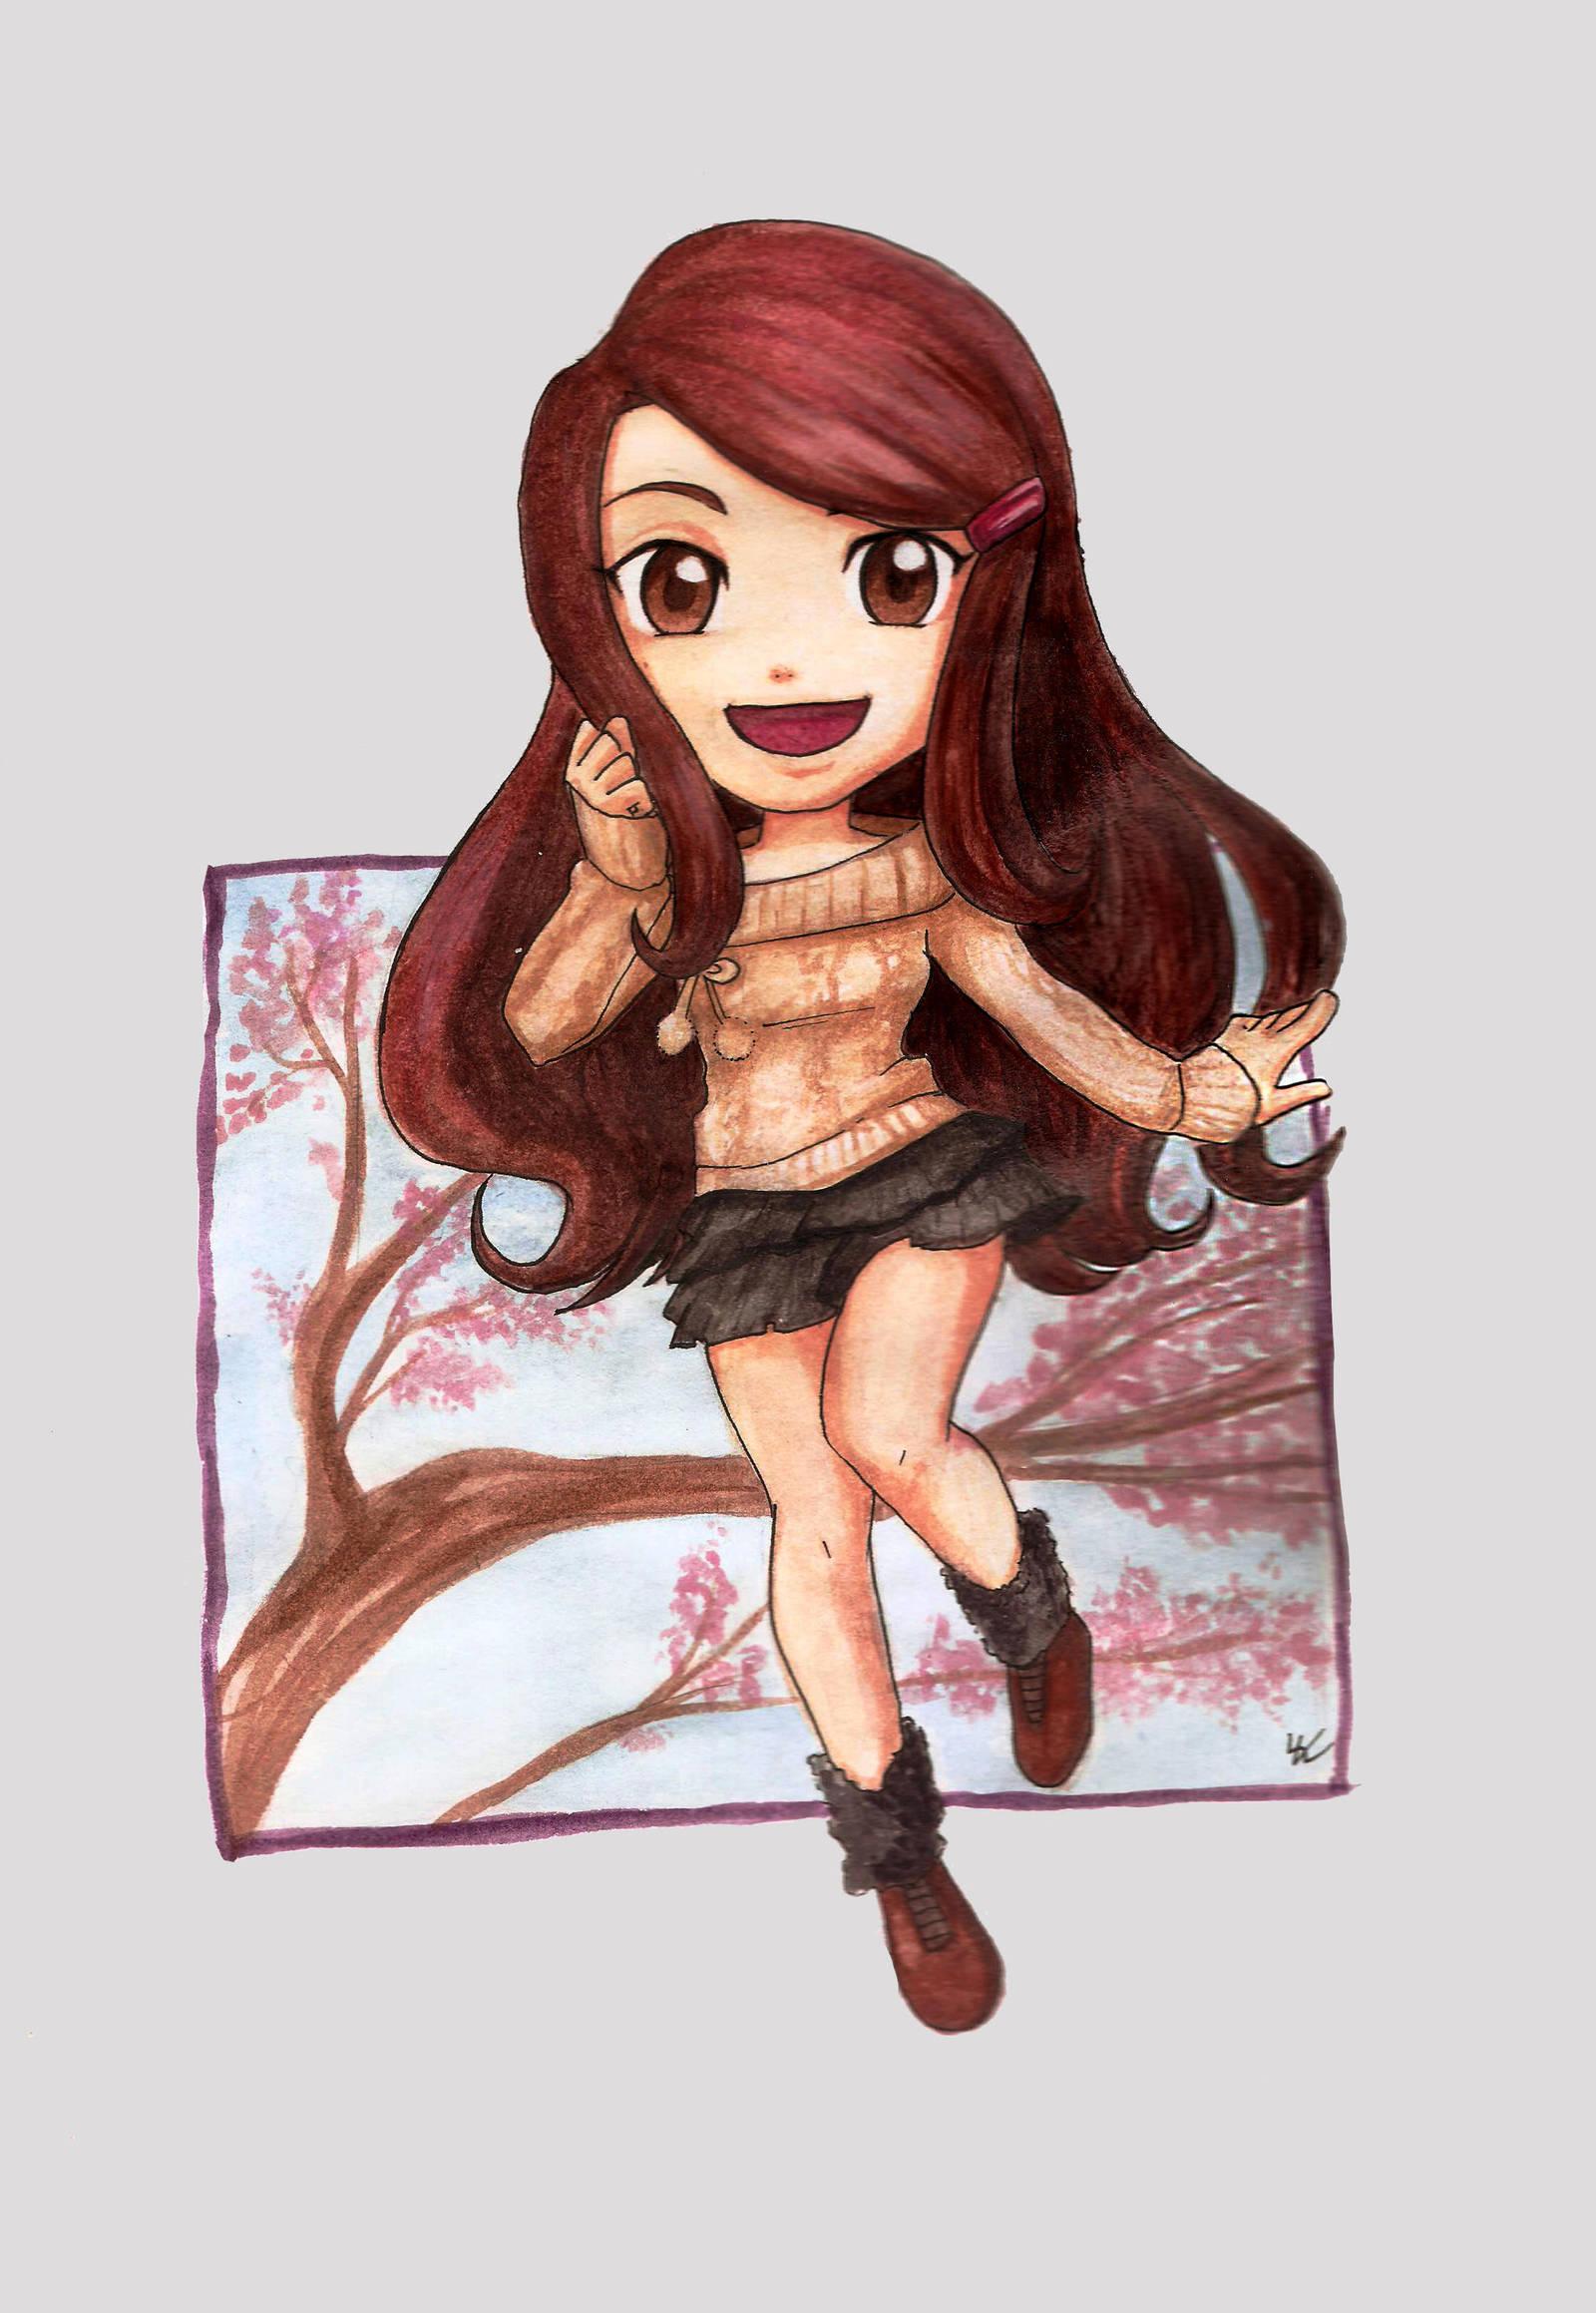 KaylaNostrade's Profile Picture